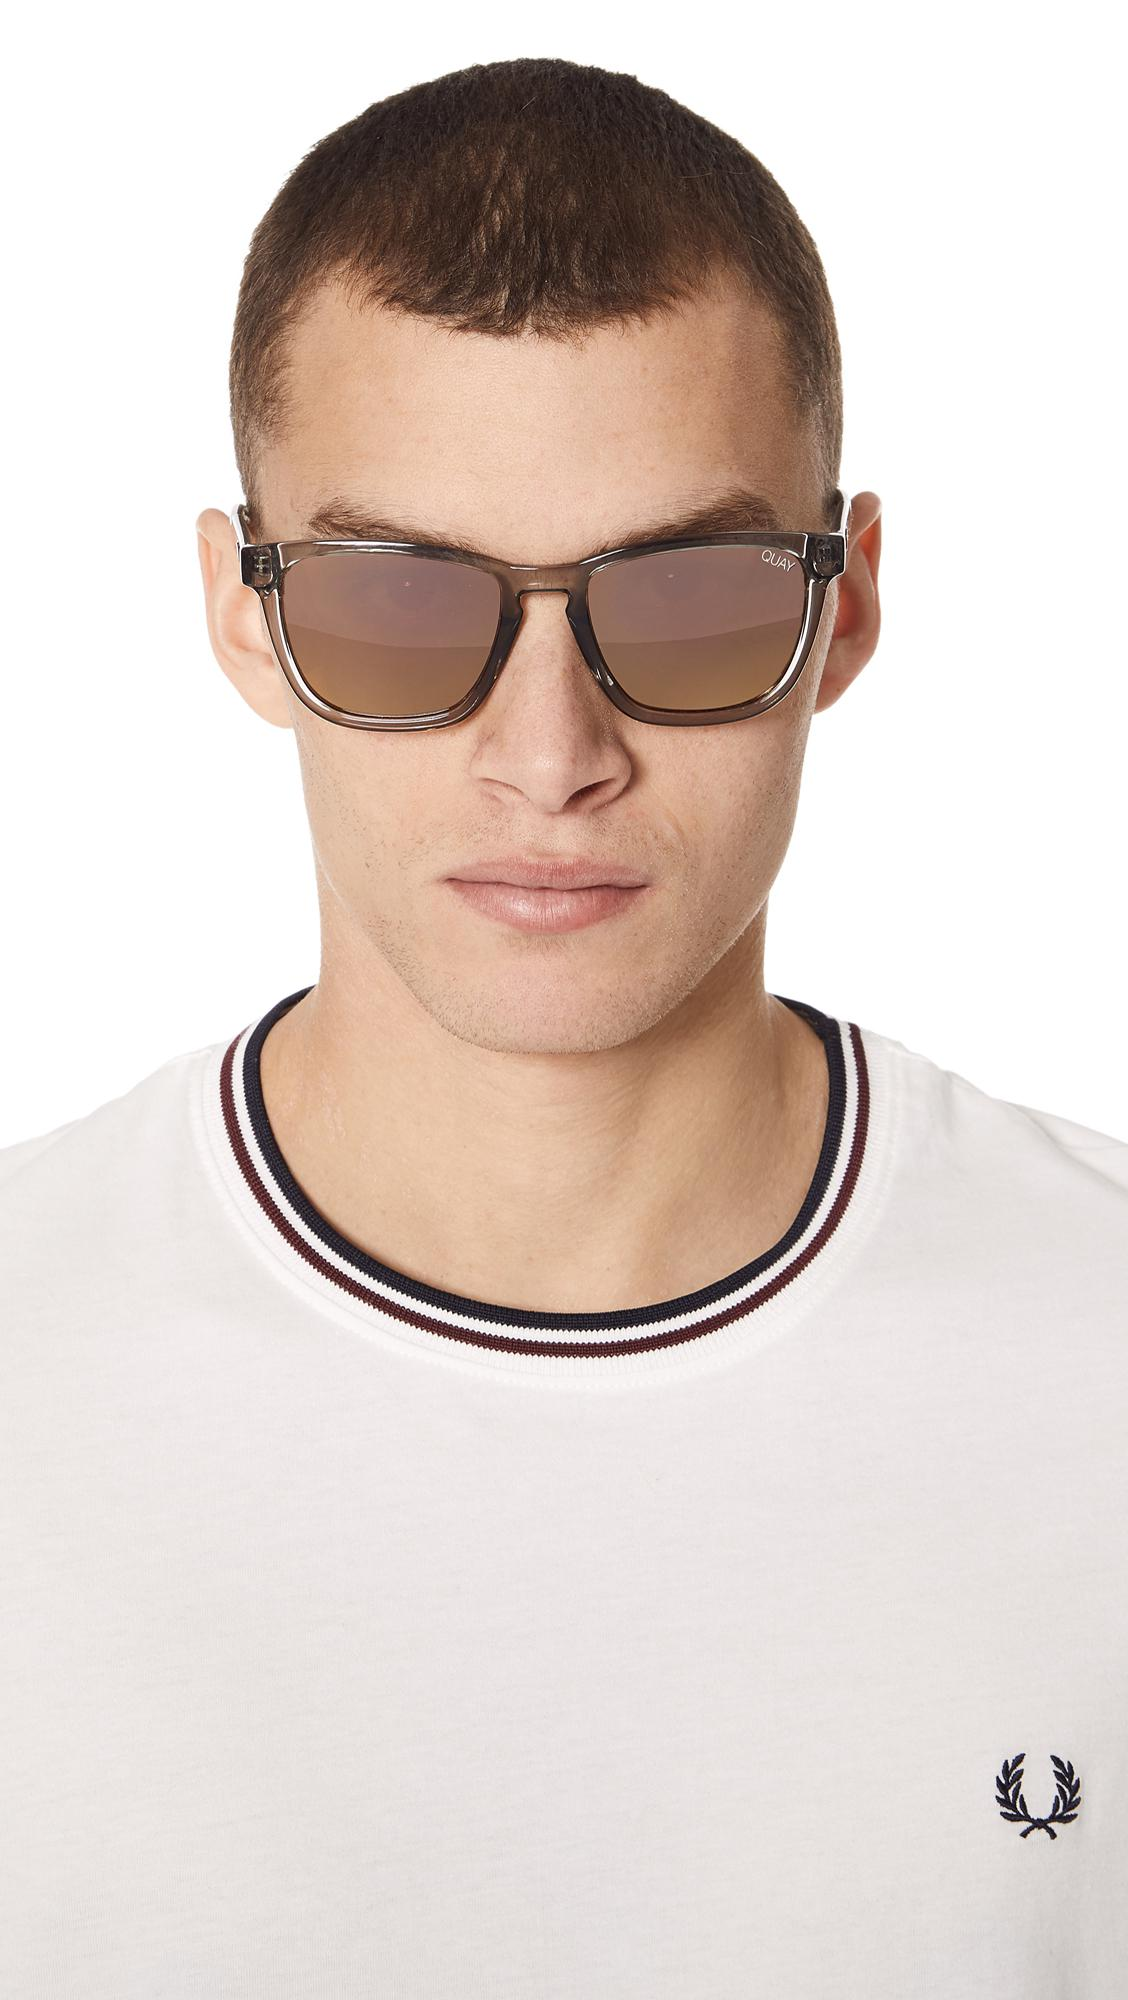 d25c5dc6ec Quay Hardwire Sunglasses in Gray for Men - Lyst